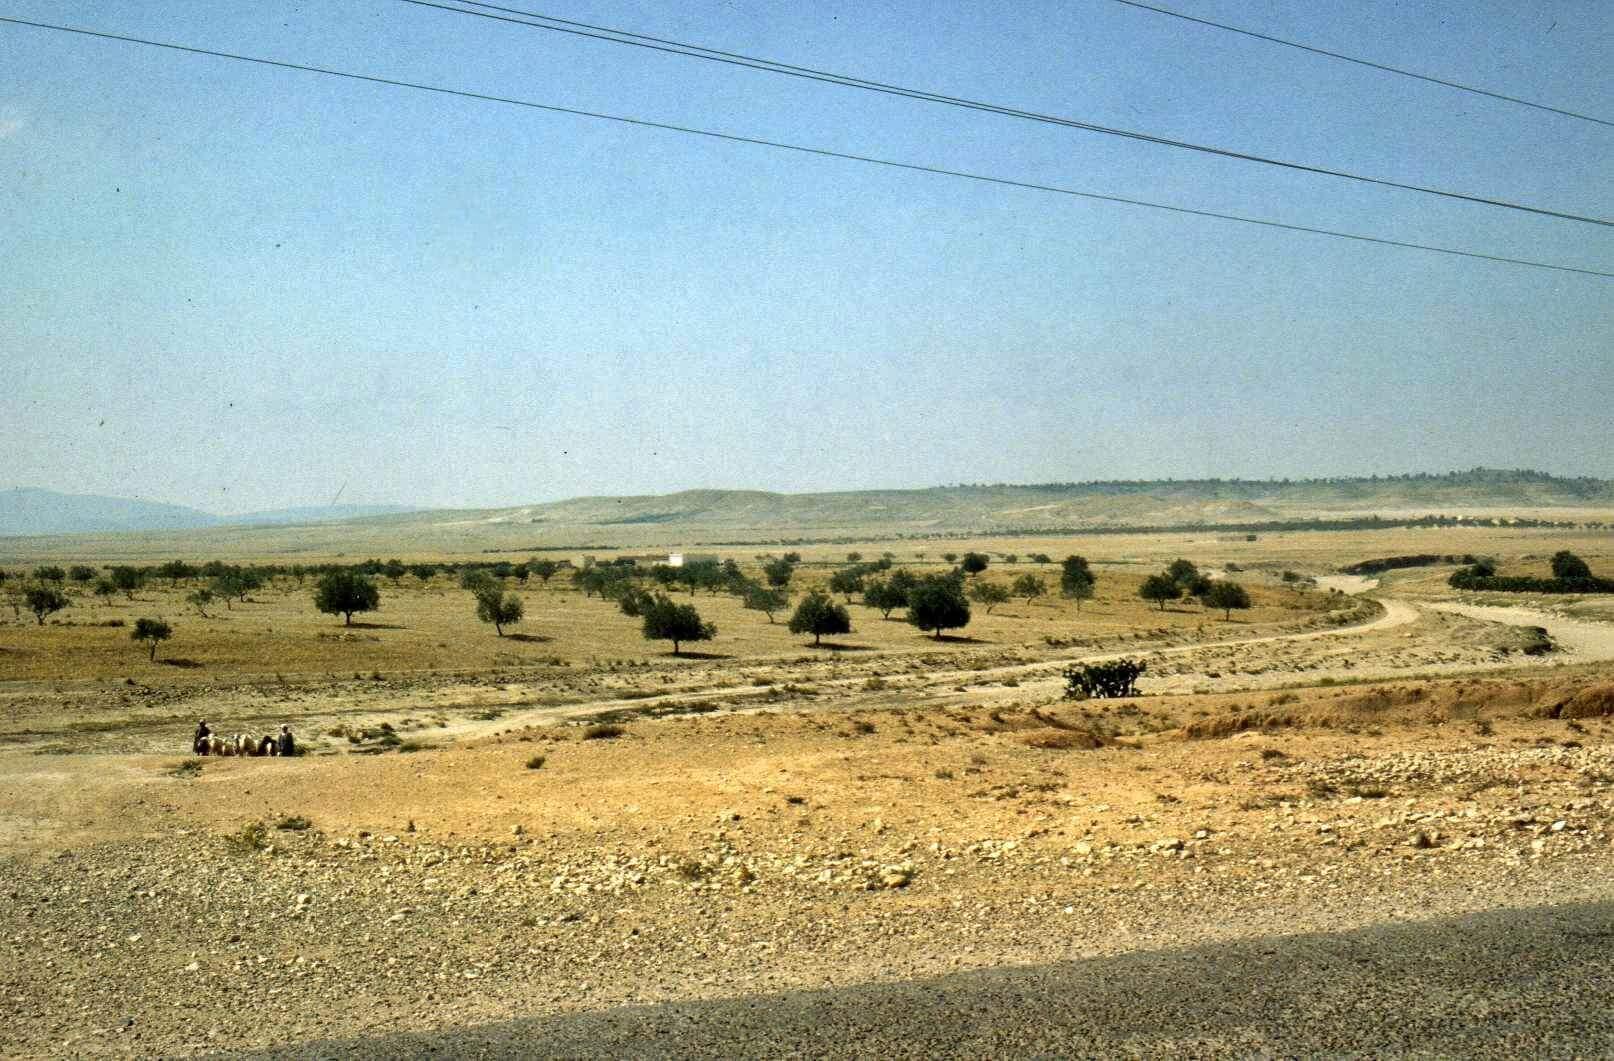 Raid moto 4x4 Tunisie Wild Spot El Kef Chebika -Tajerouine